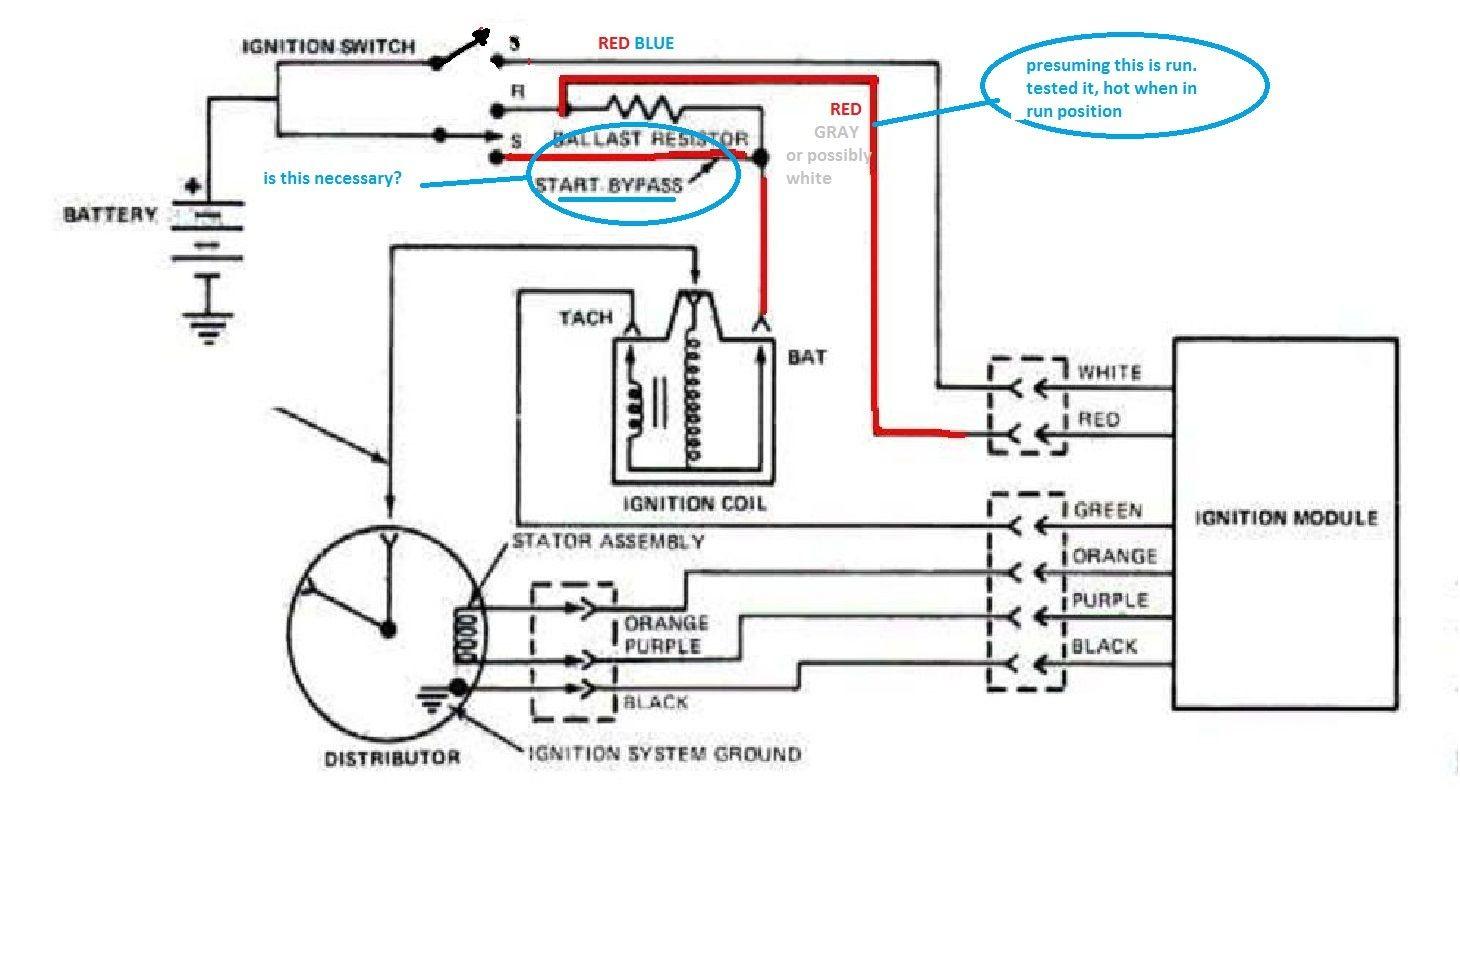 4500 ford backhoe wiring diagram ford 555 backhoe wiring parts kipas www tintenglueck de  ford 555 backhoe wiring parts kipas